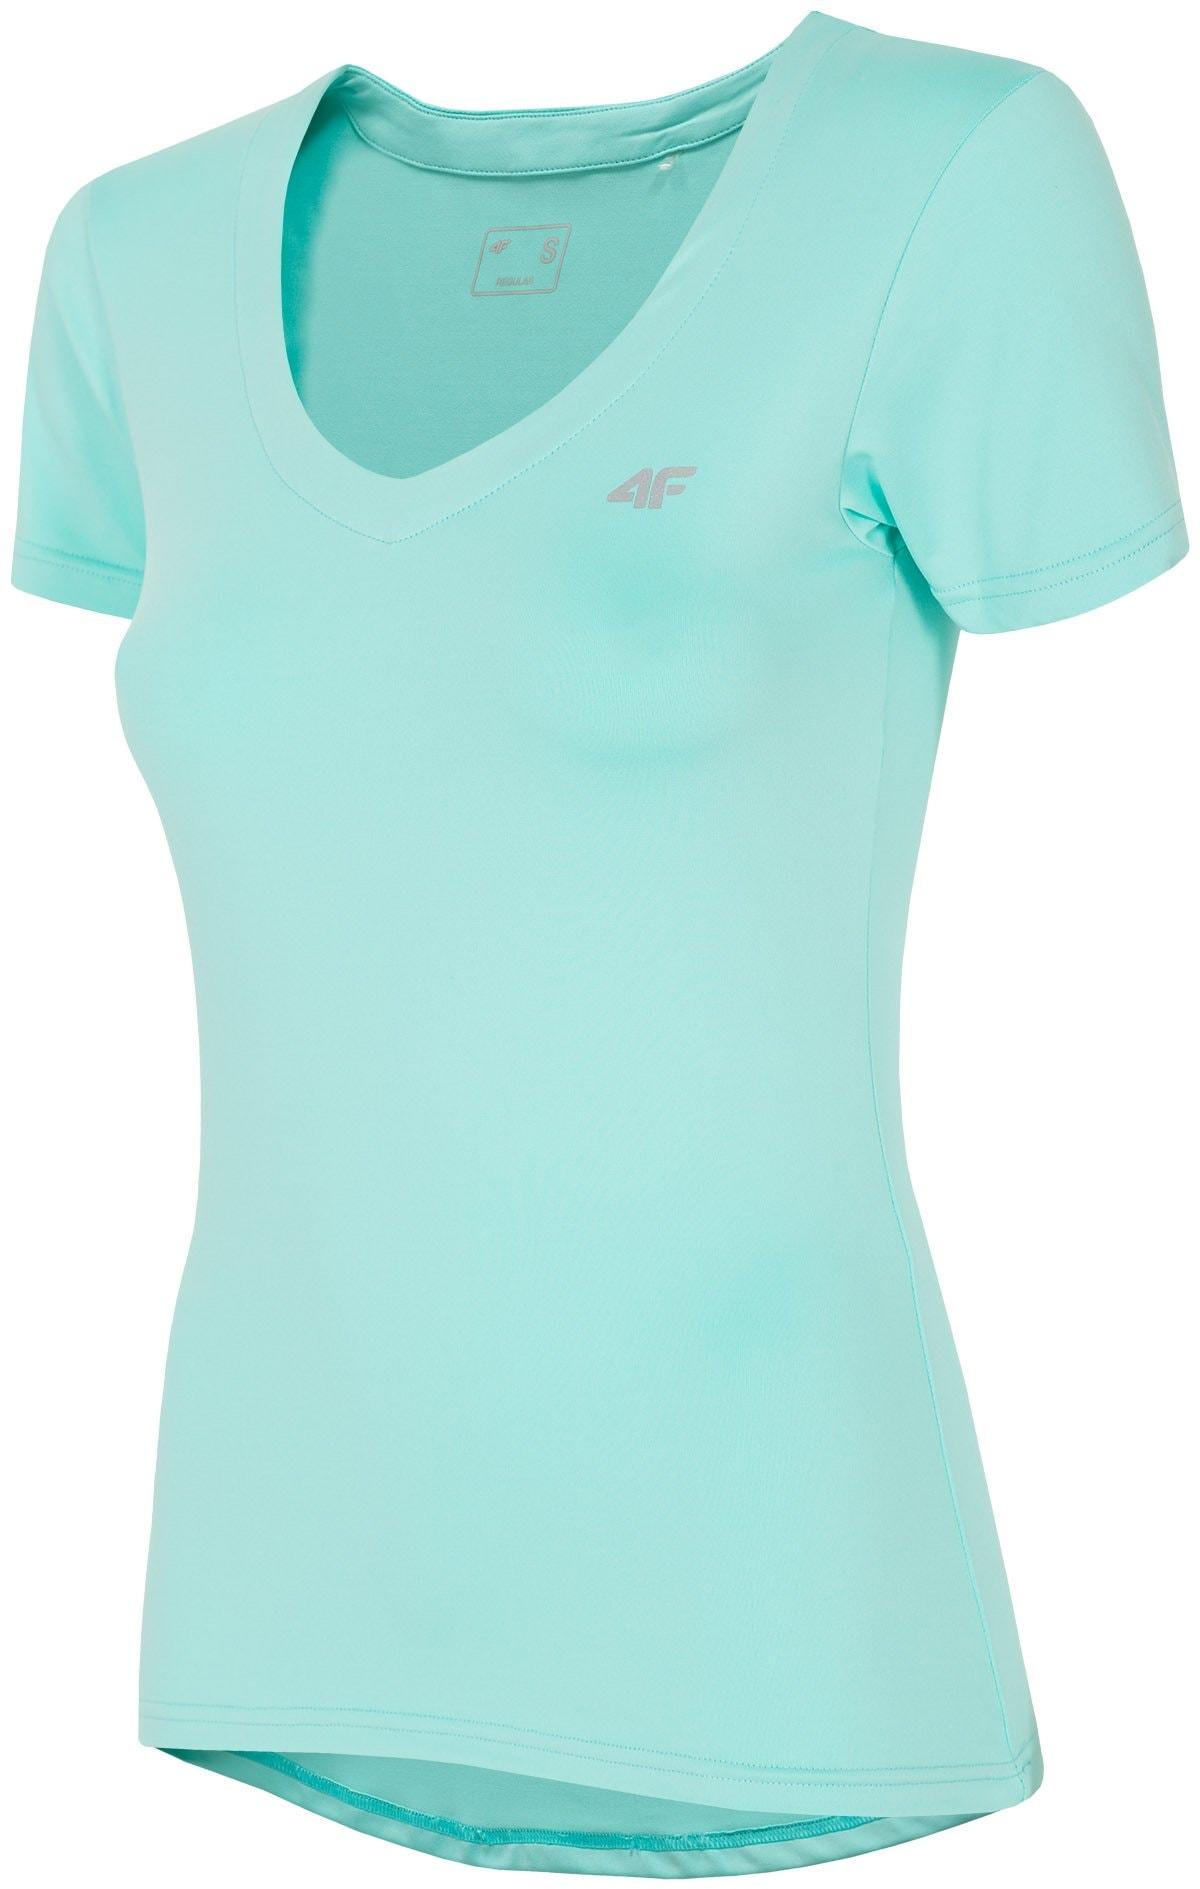 Koszulka treningowa damska TSDF300 - mięta